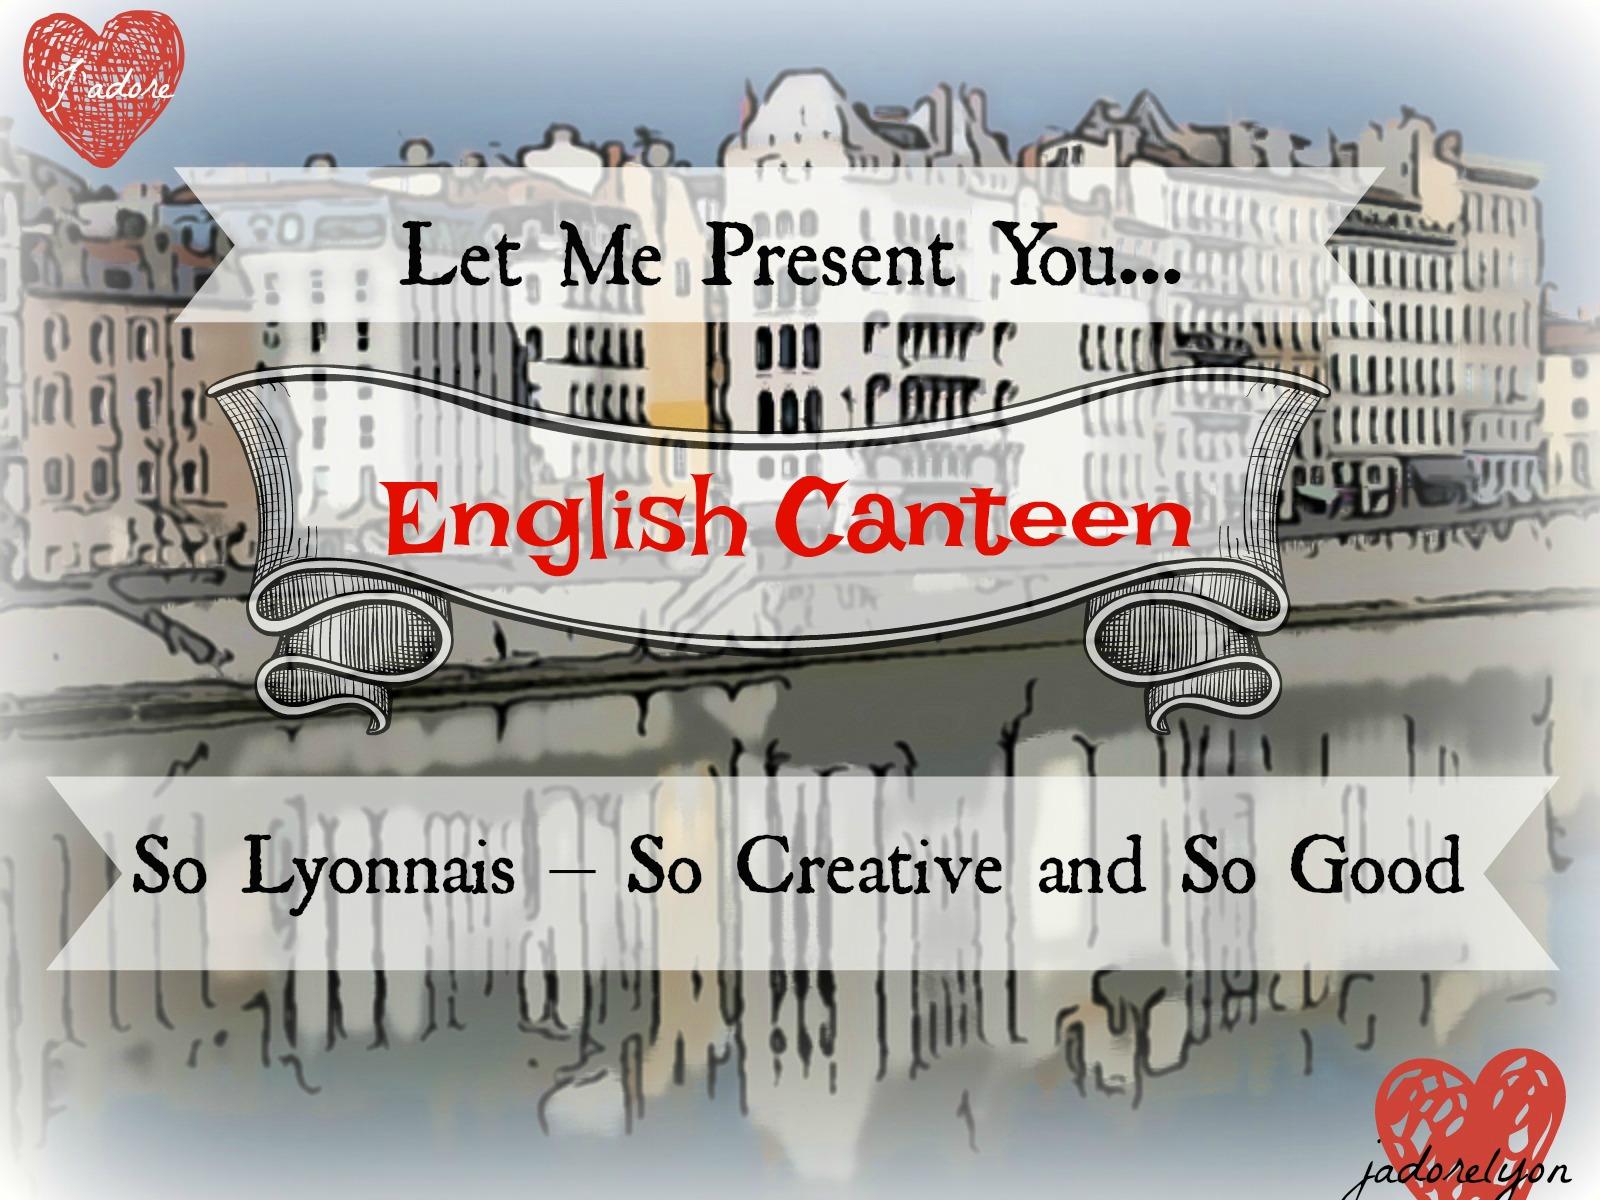 Let me present you - English Canteen